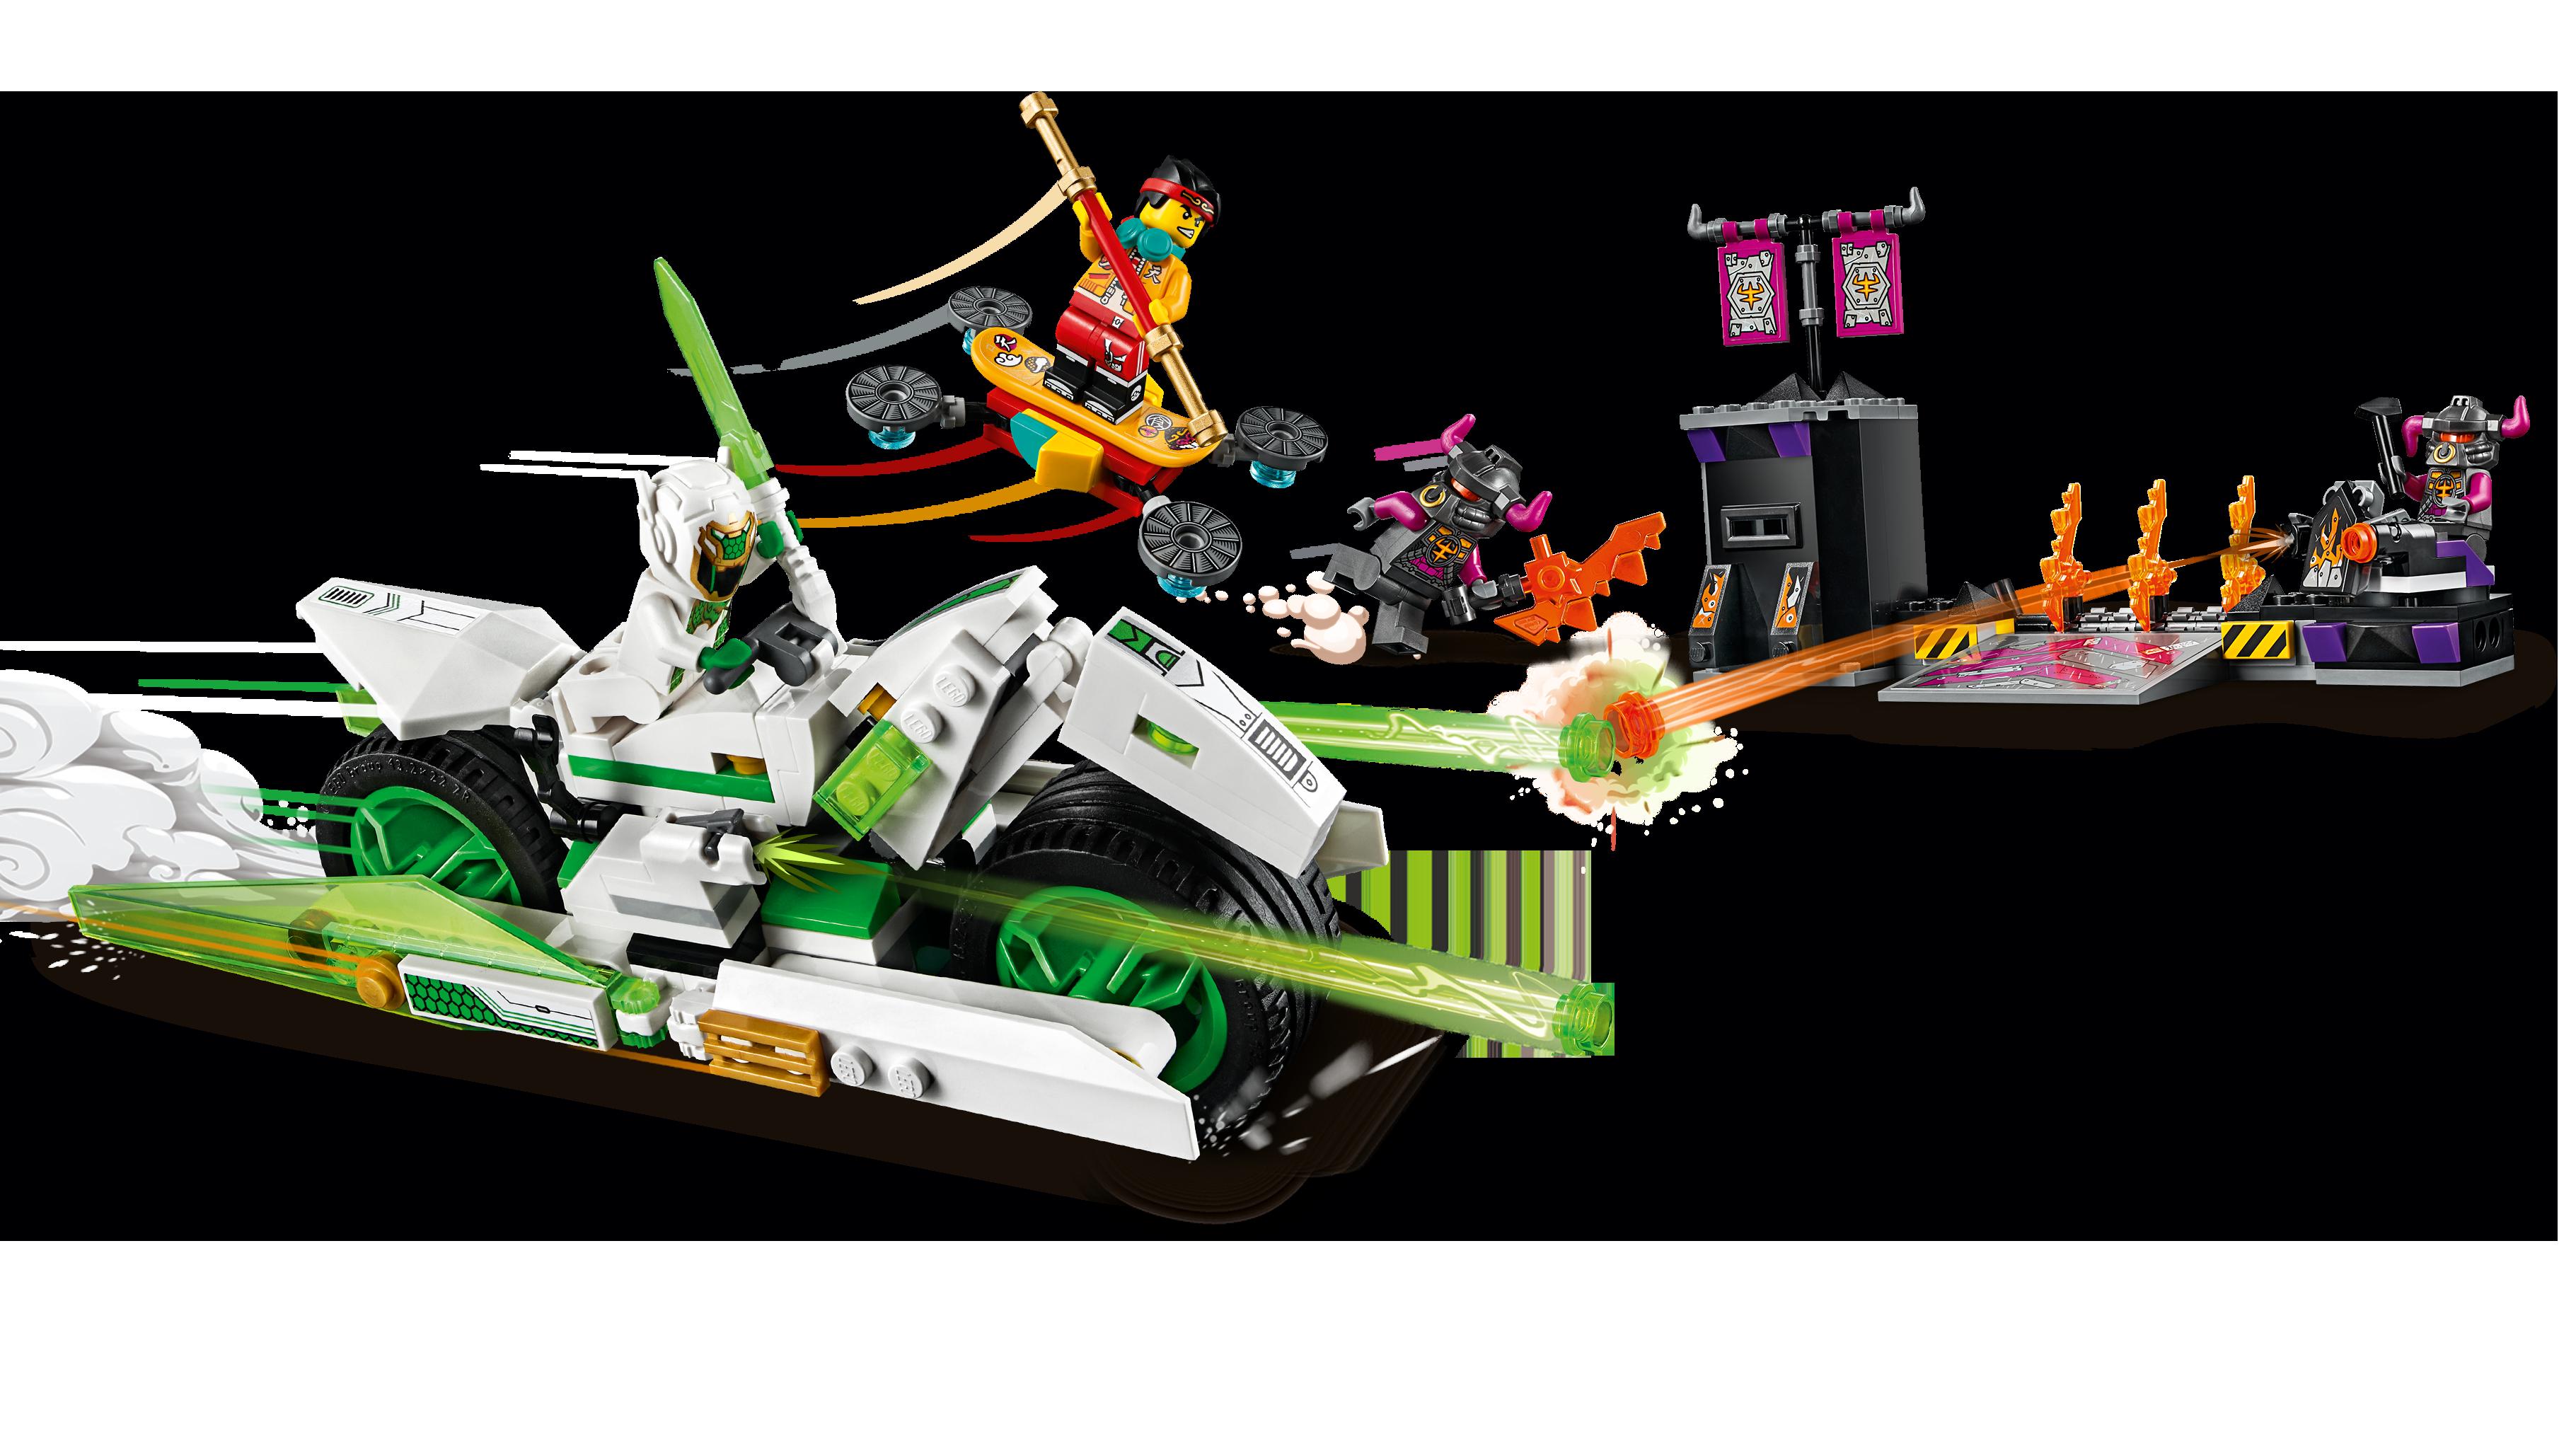 LEGO Monkie Kid 80006 Vit drakhästcykel